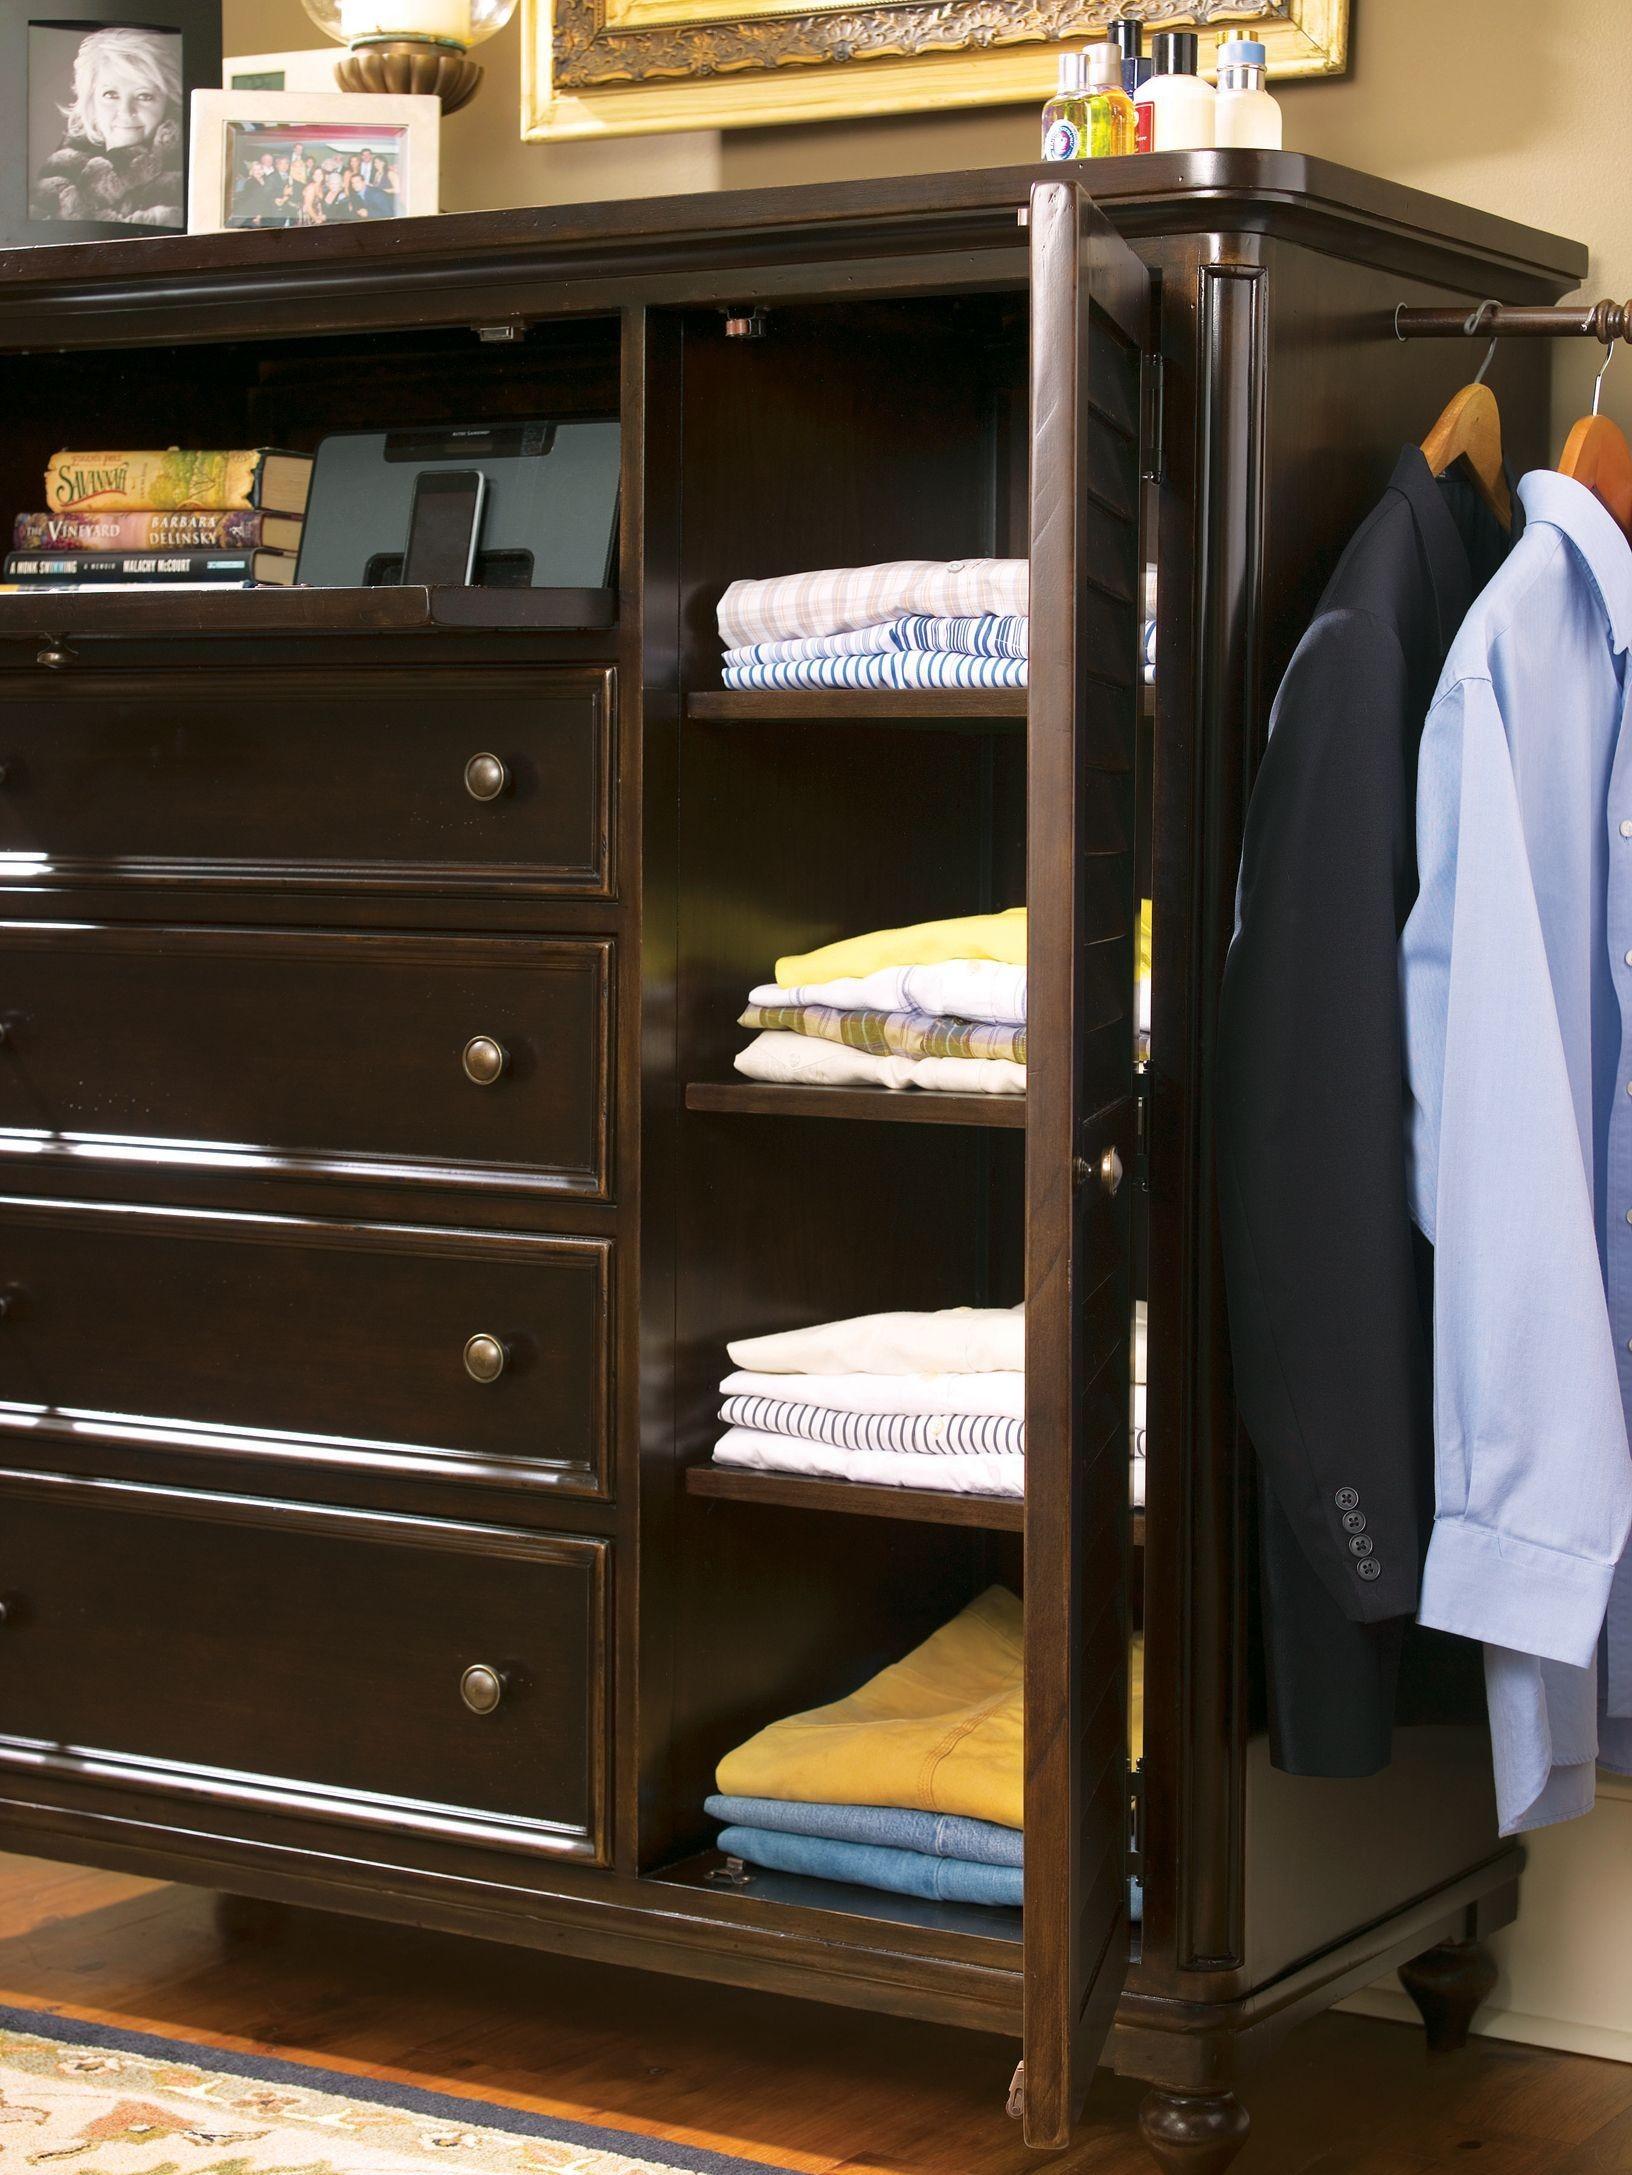 Paula deen home tobacco 4 drawer door chest from paula - Paula deen tobacco bedroom furniture ...